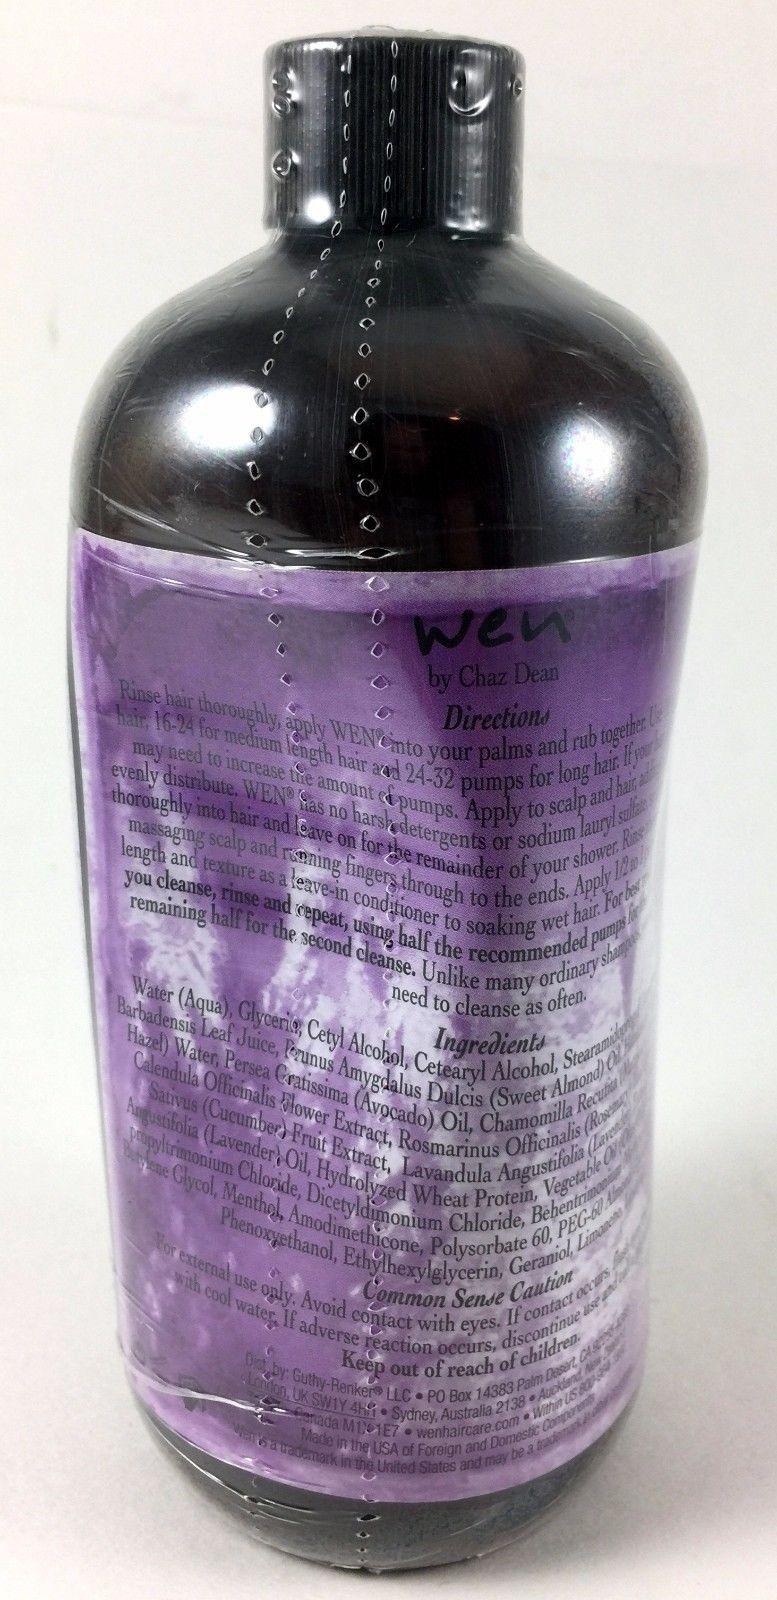 Wen Lavender Cleansing Conditioner 16 fl oz. All Hair Types NO PUMP